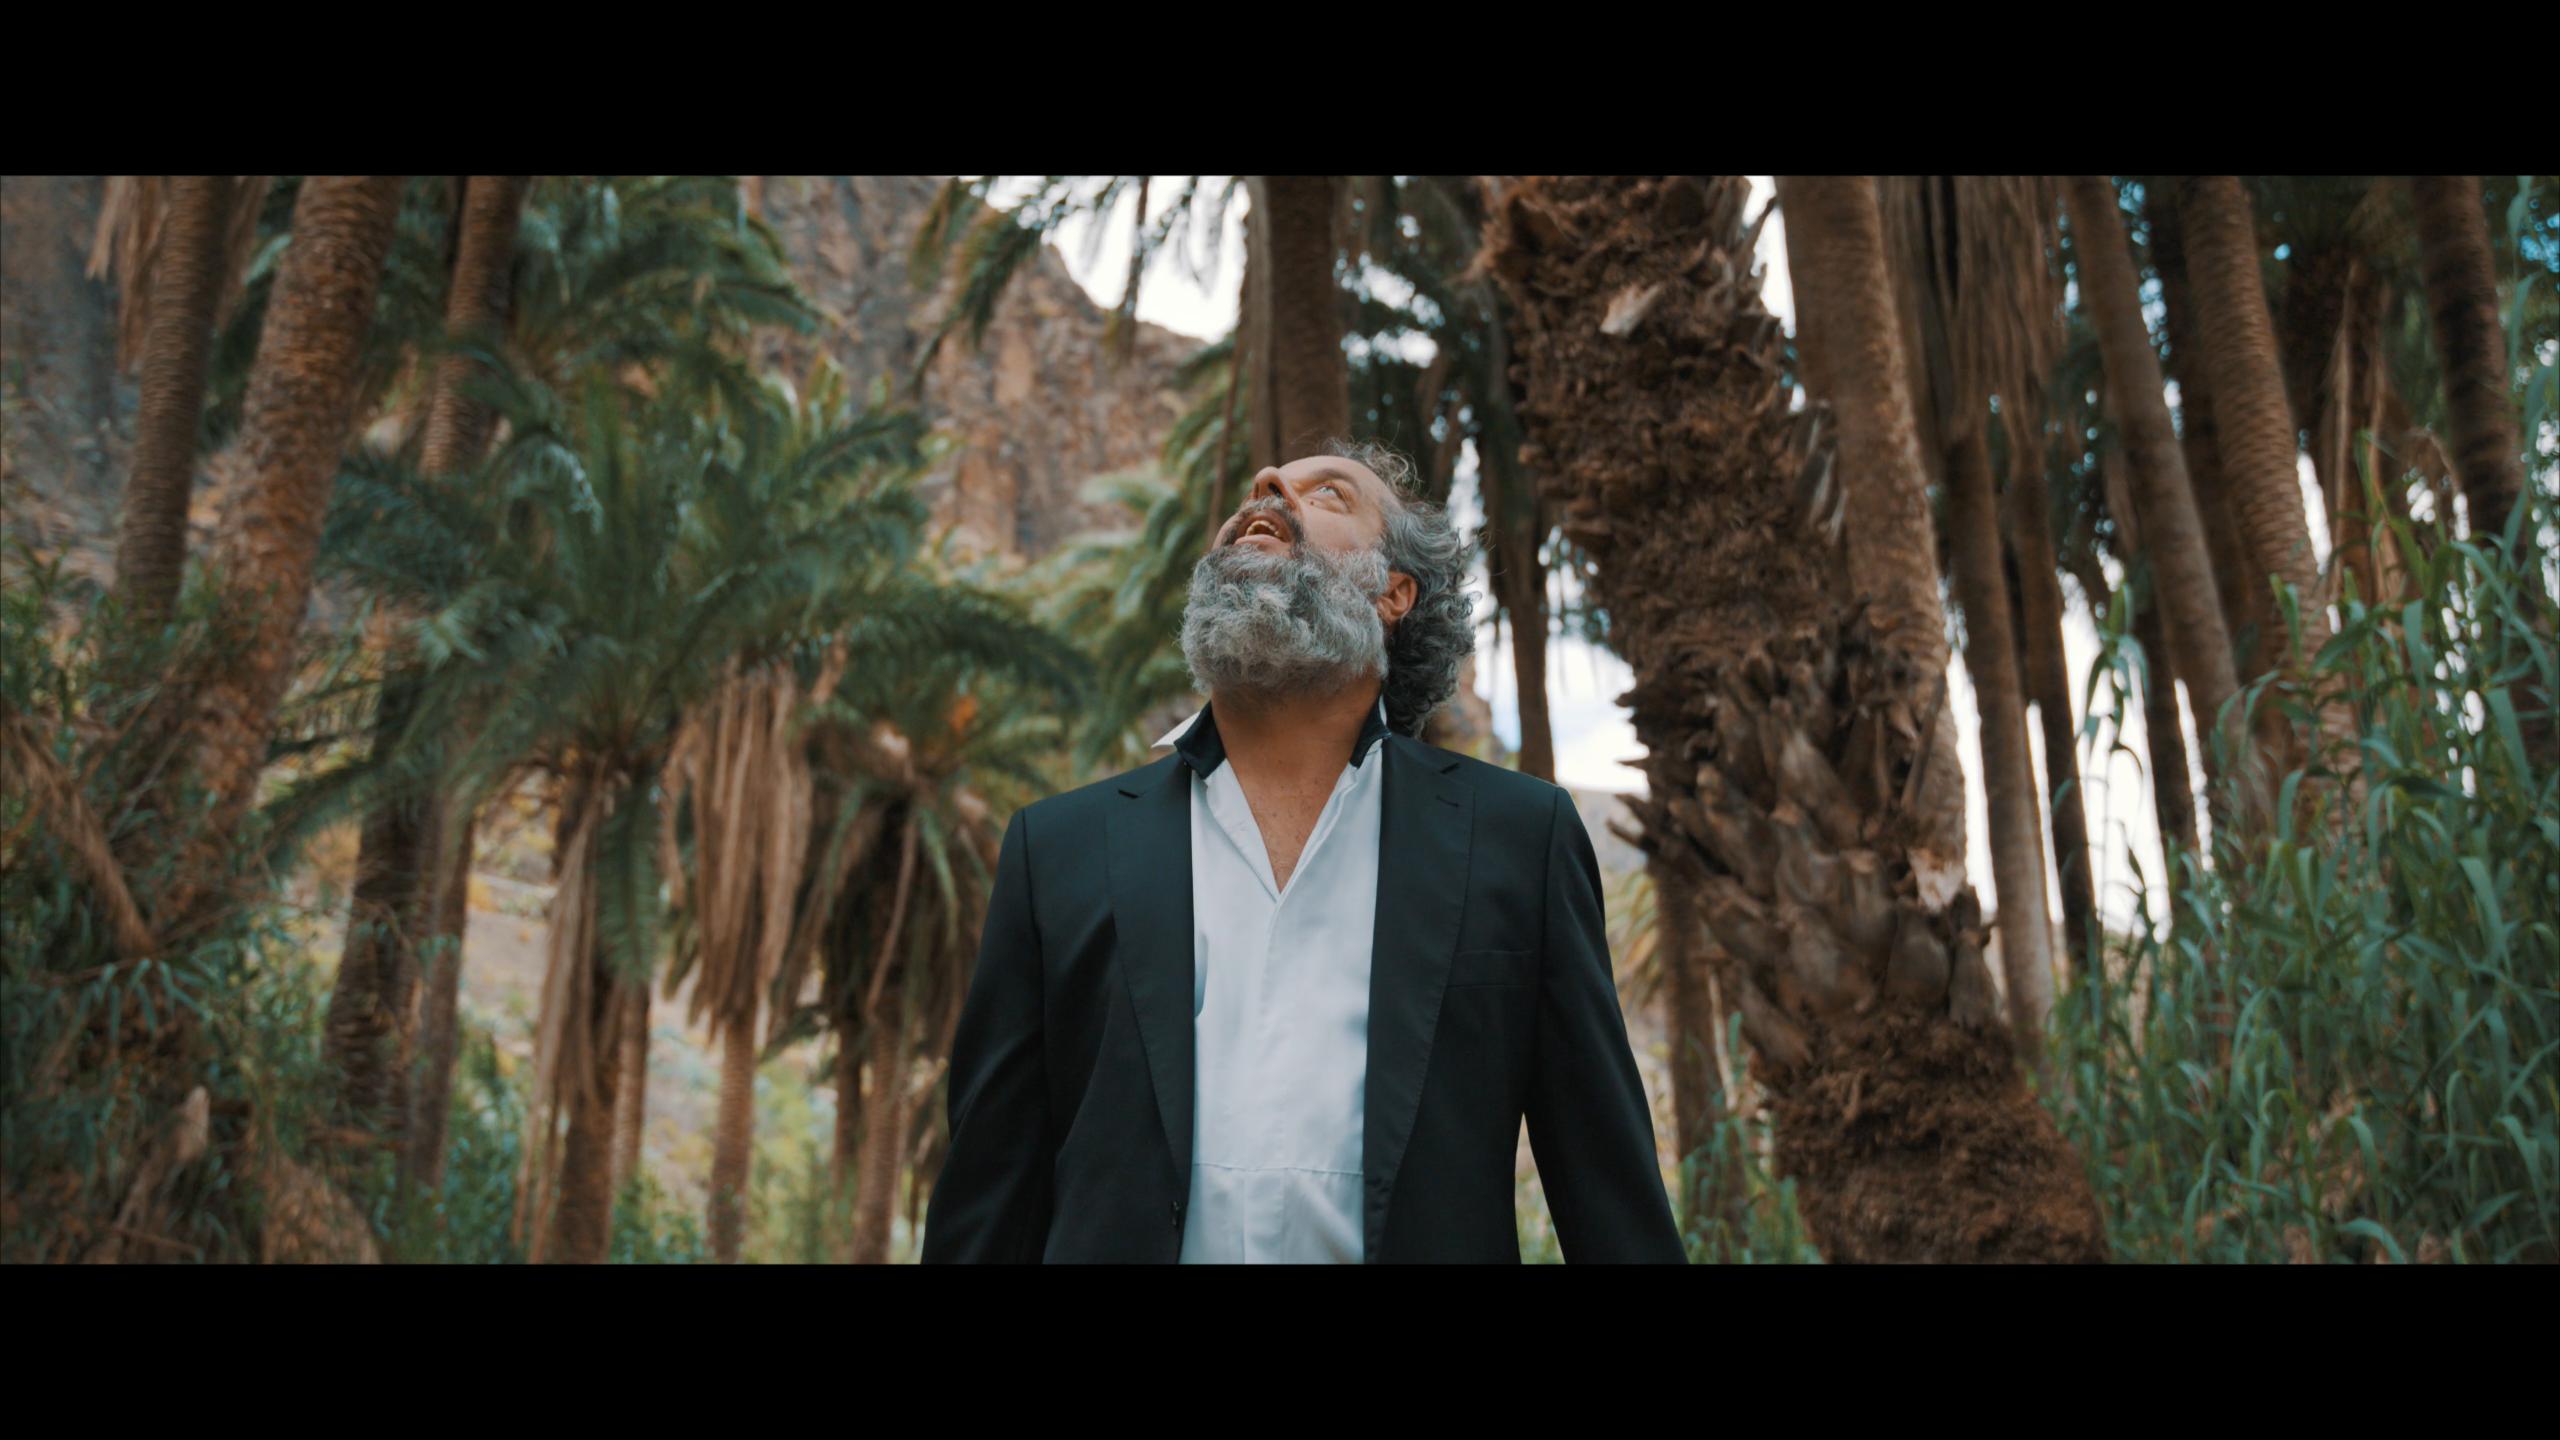 Fic Galdar Luifer Rodríguez 2396 Films